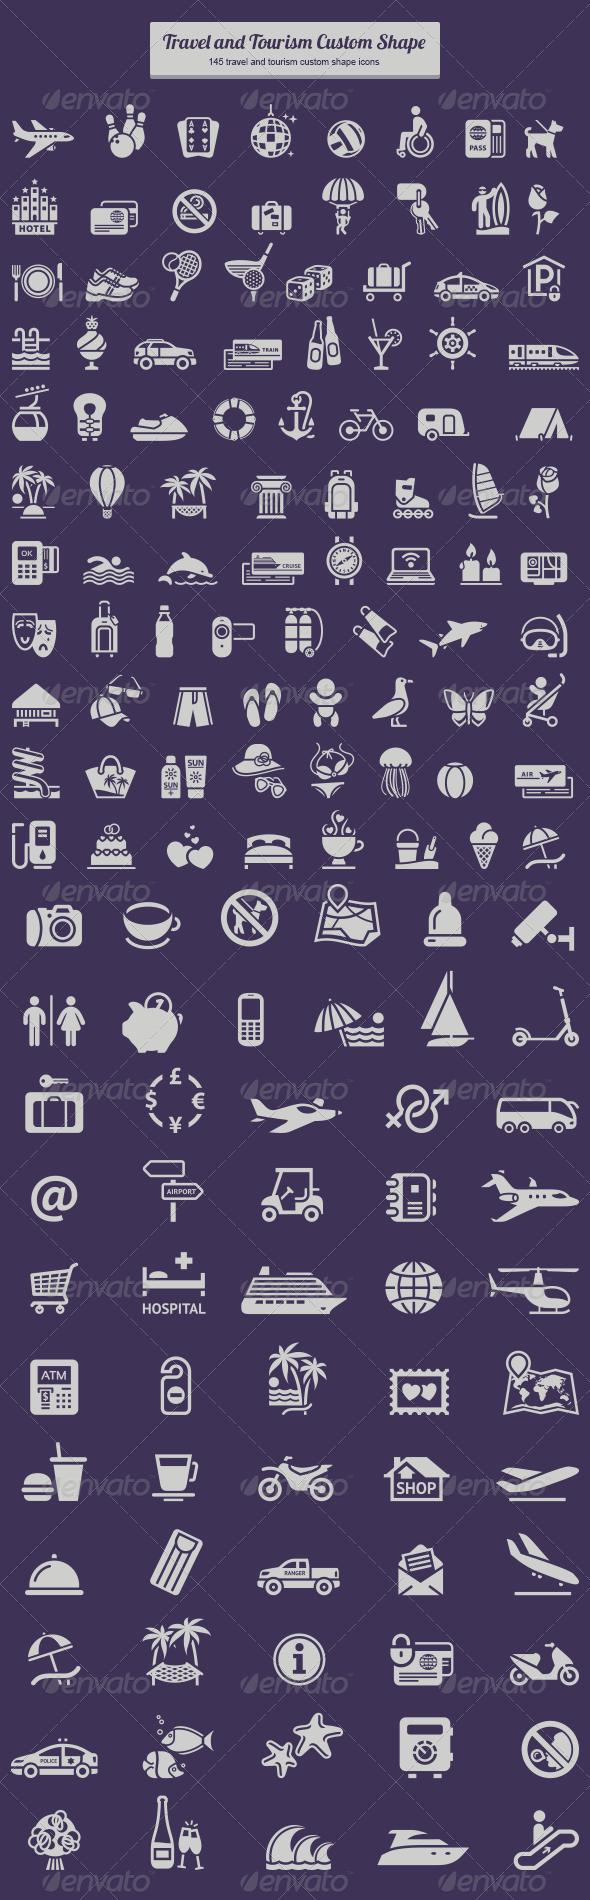 Travel and Tourism Custom Shape